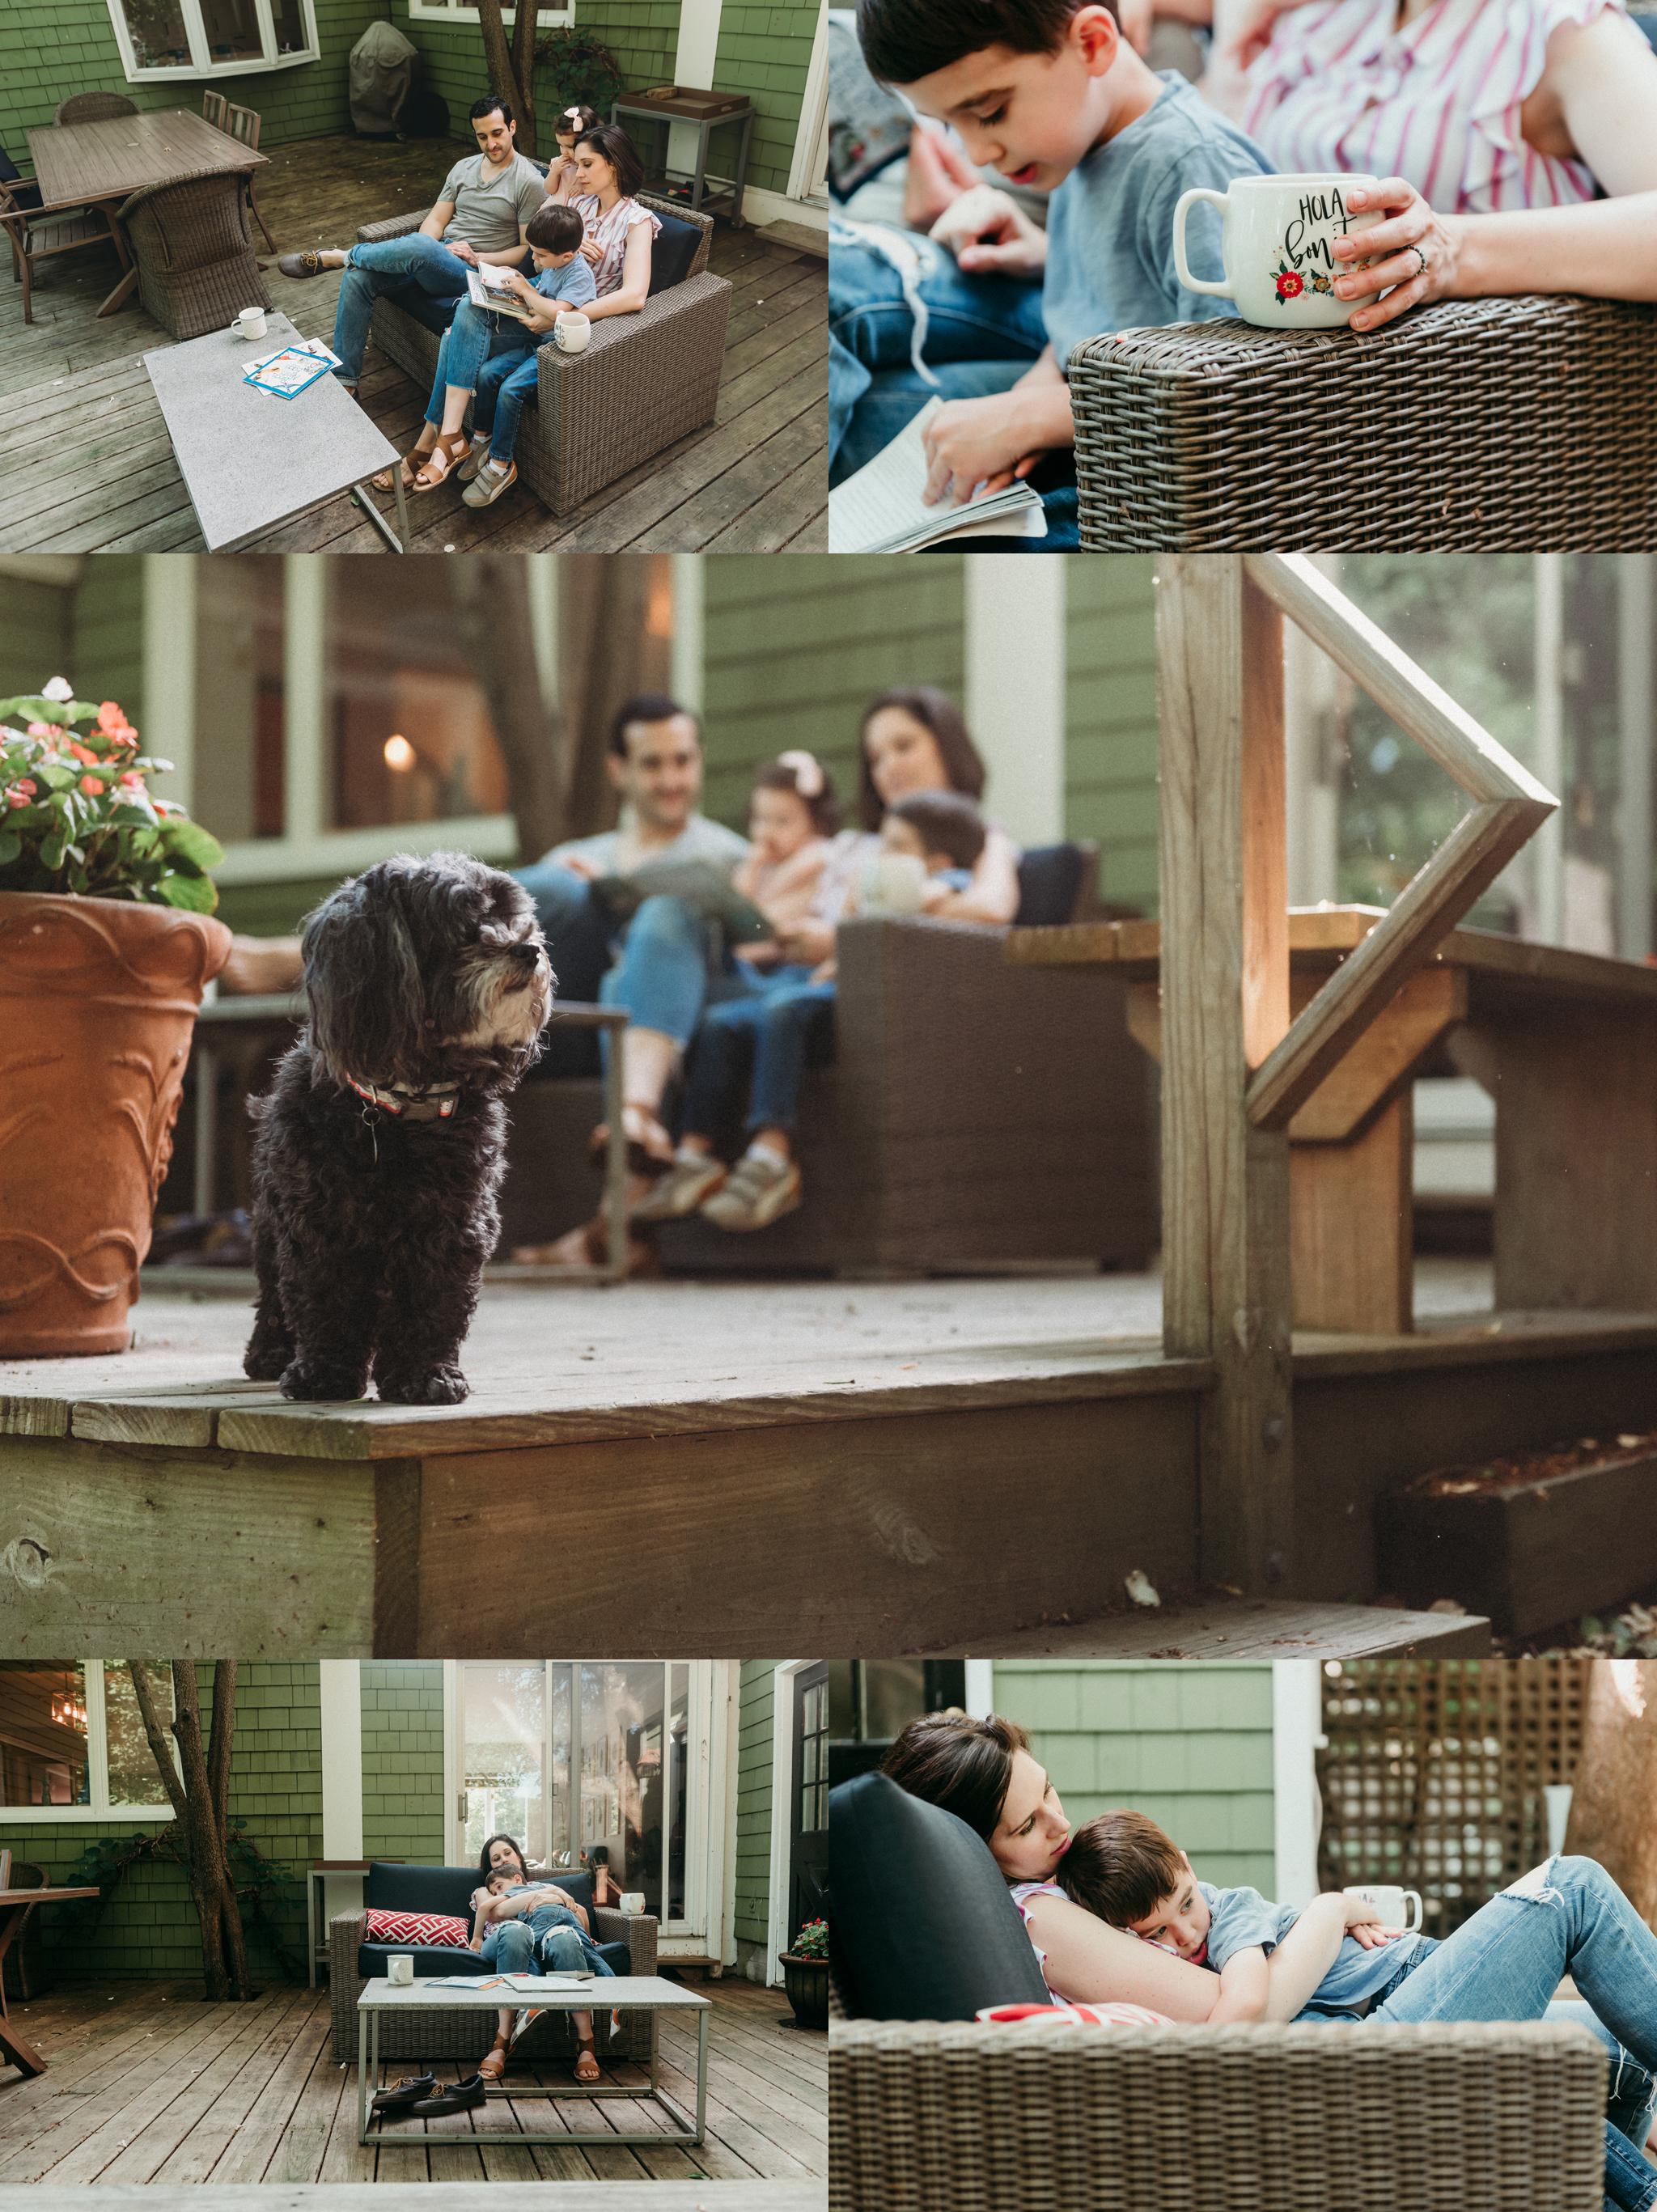 amy-drucker-lifestyle-family-photography-3.jpg